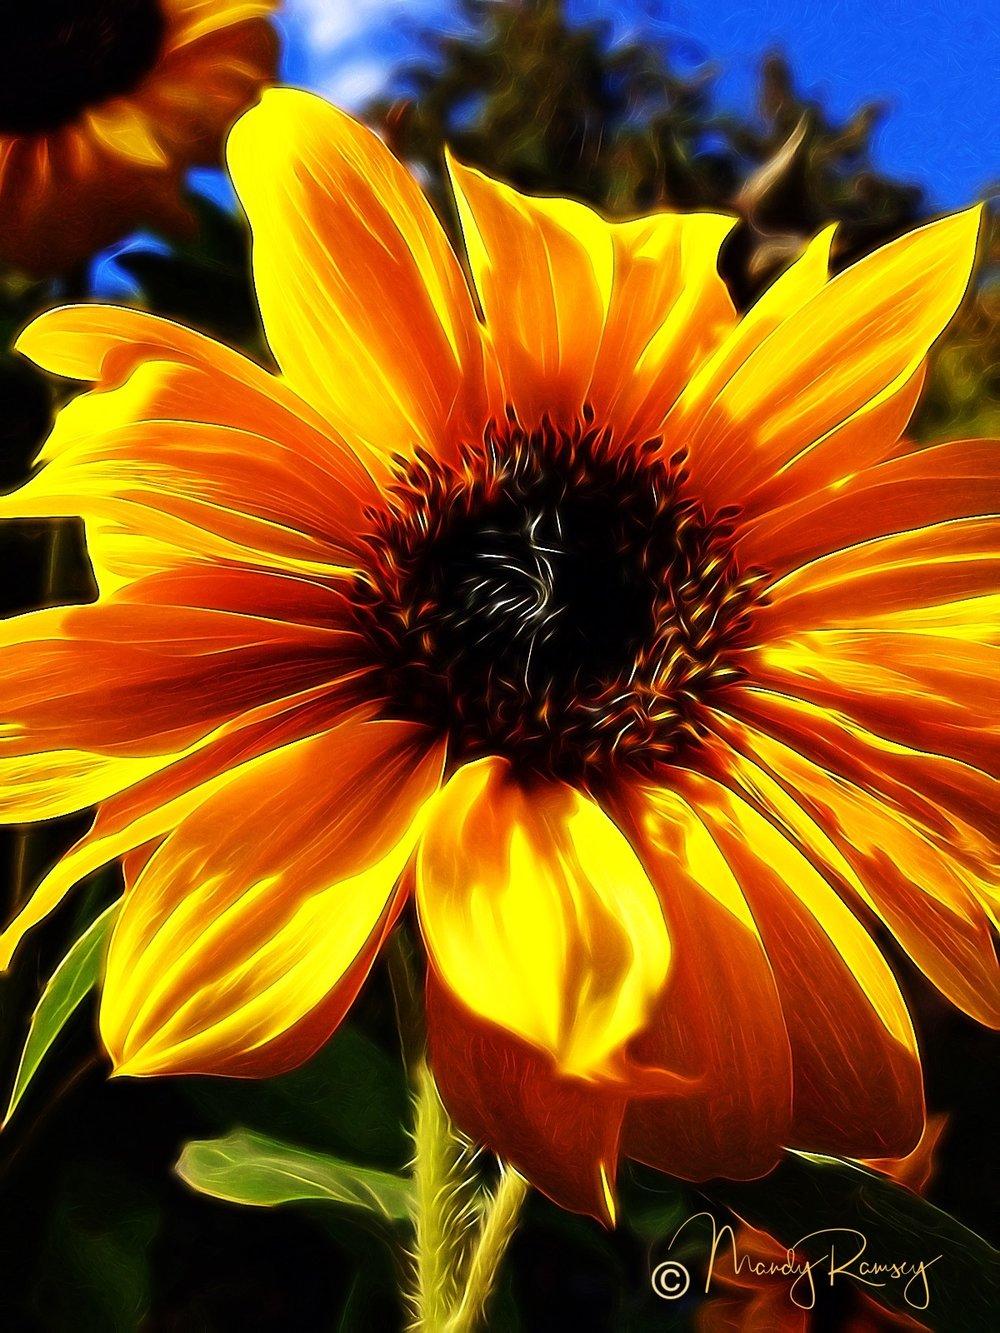 amplified sunflowerwatermarked.jpg